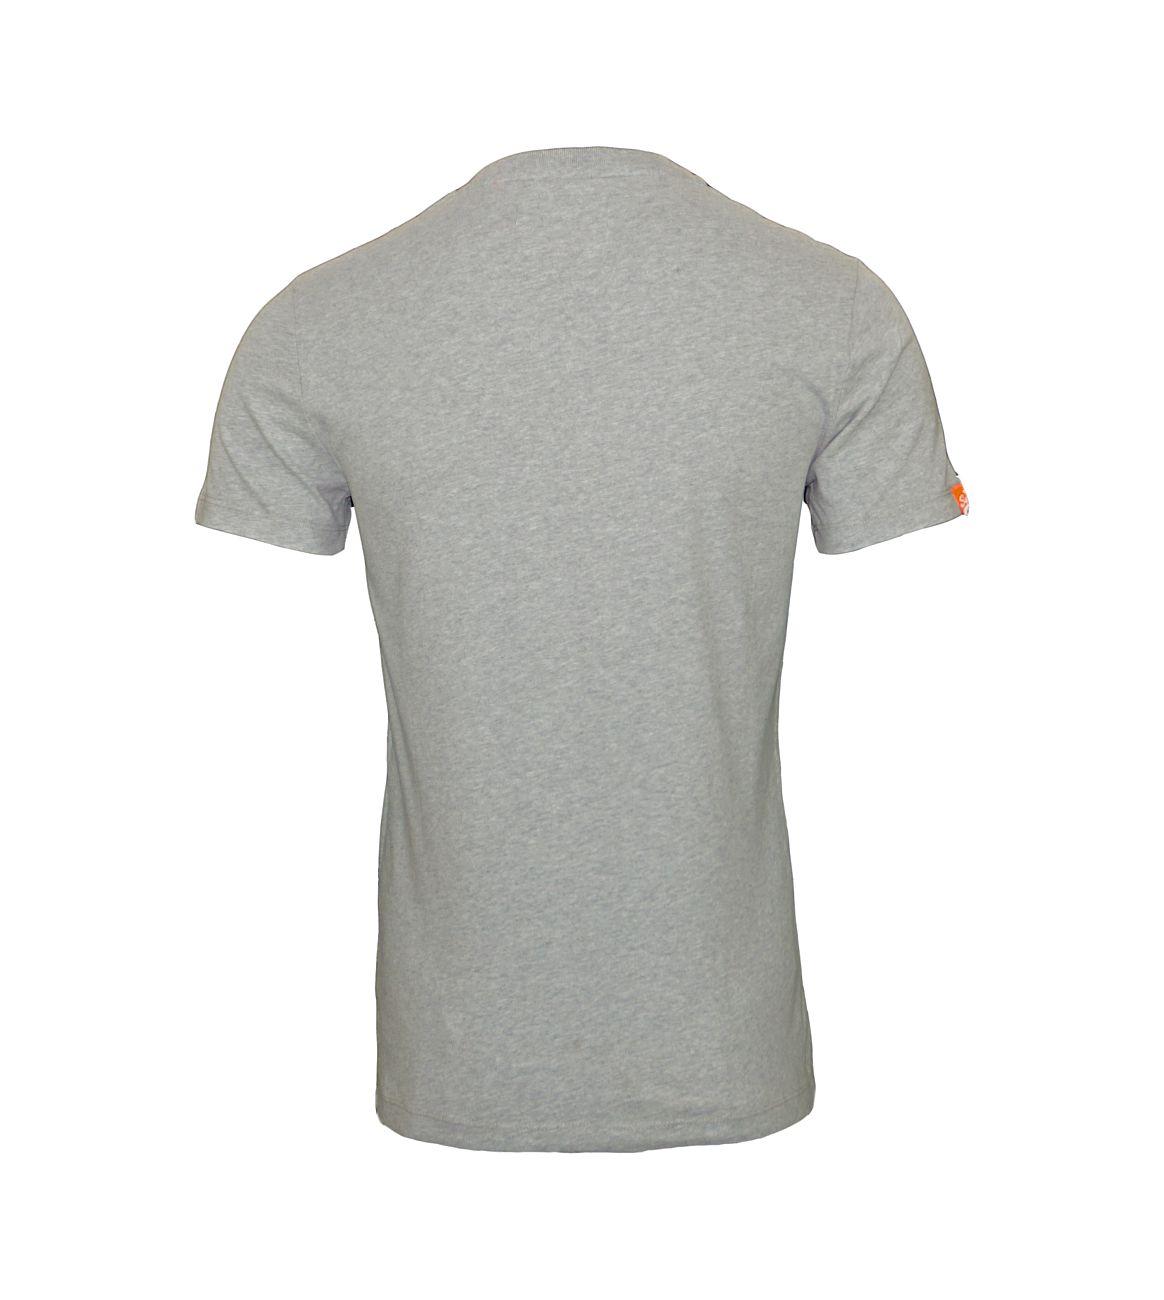 Superdry T-Shirt Orange Label VNTGE EMB VEE Tee M10001NS1 Grey Marl F18-SDT1